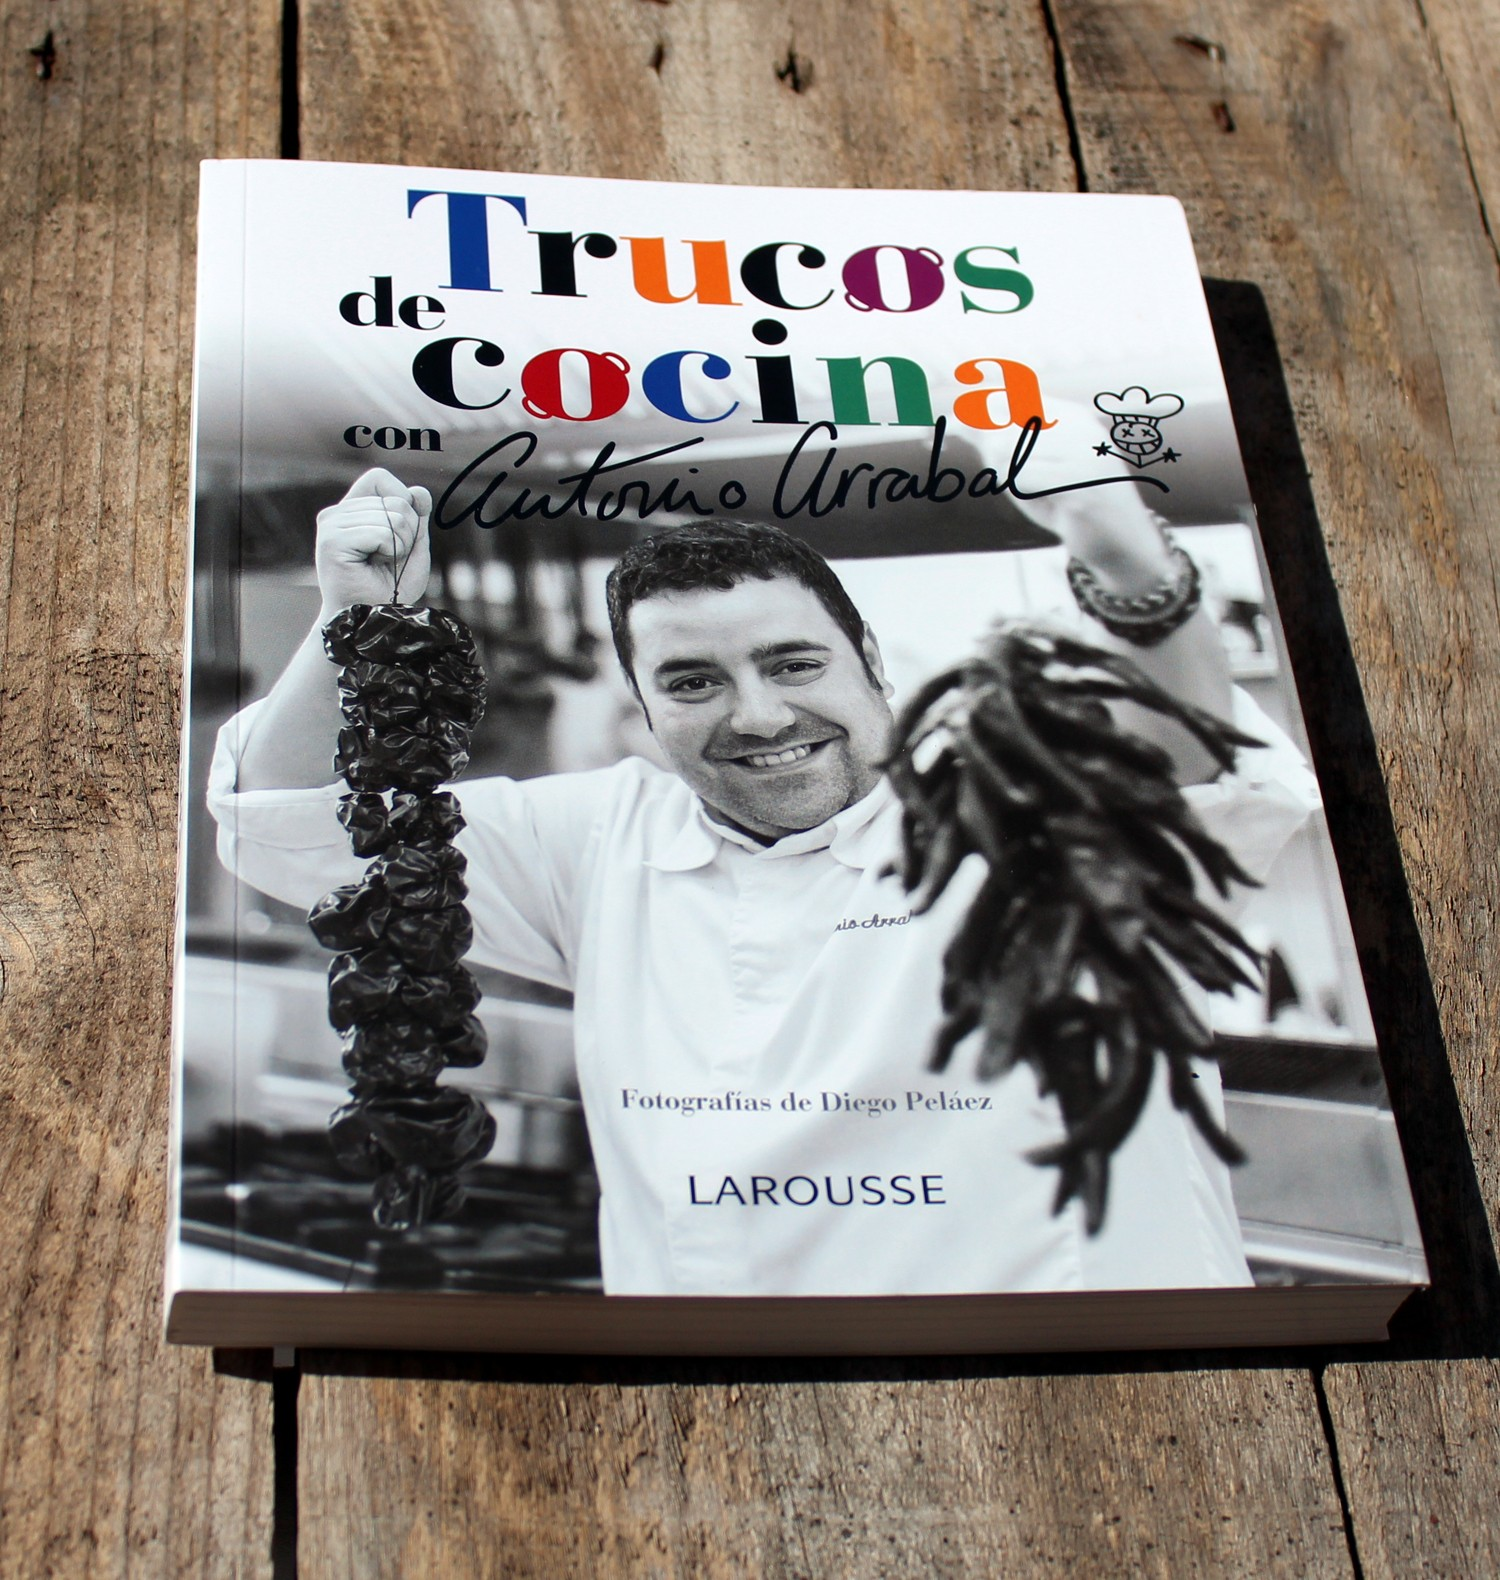 trucos de cocina con antonio arrabal - libro